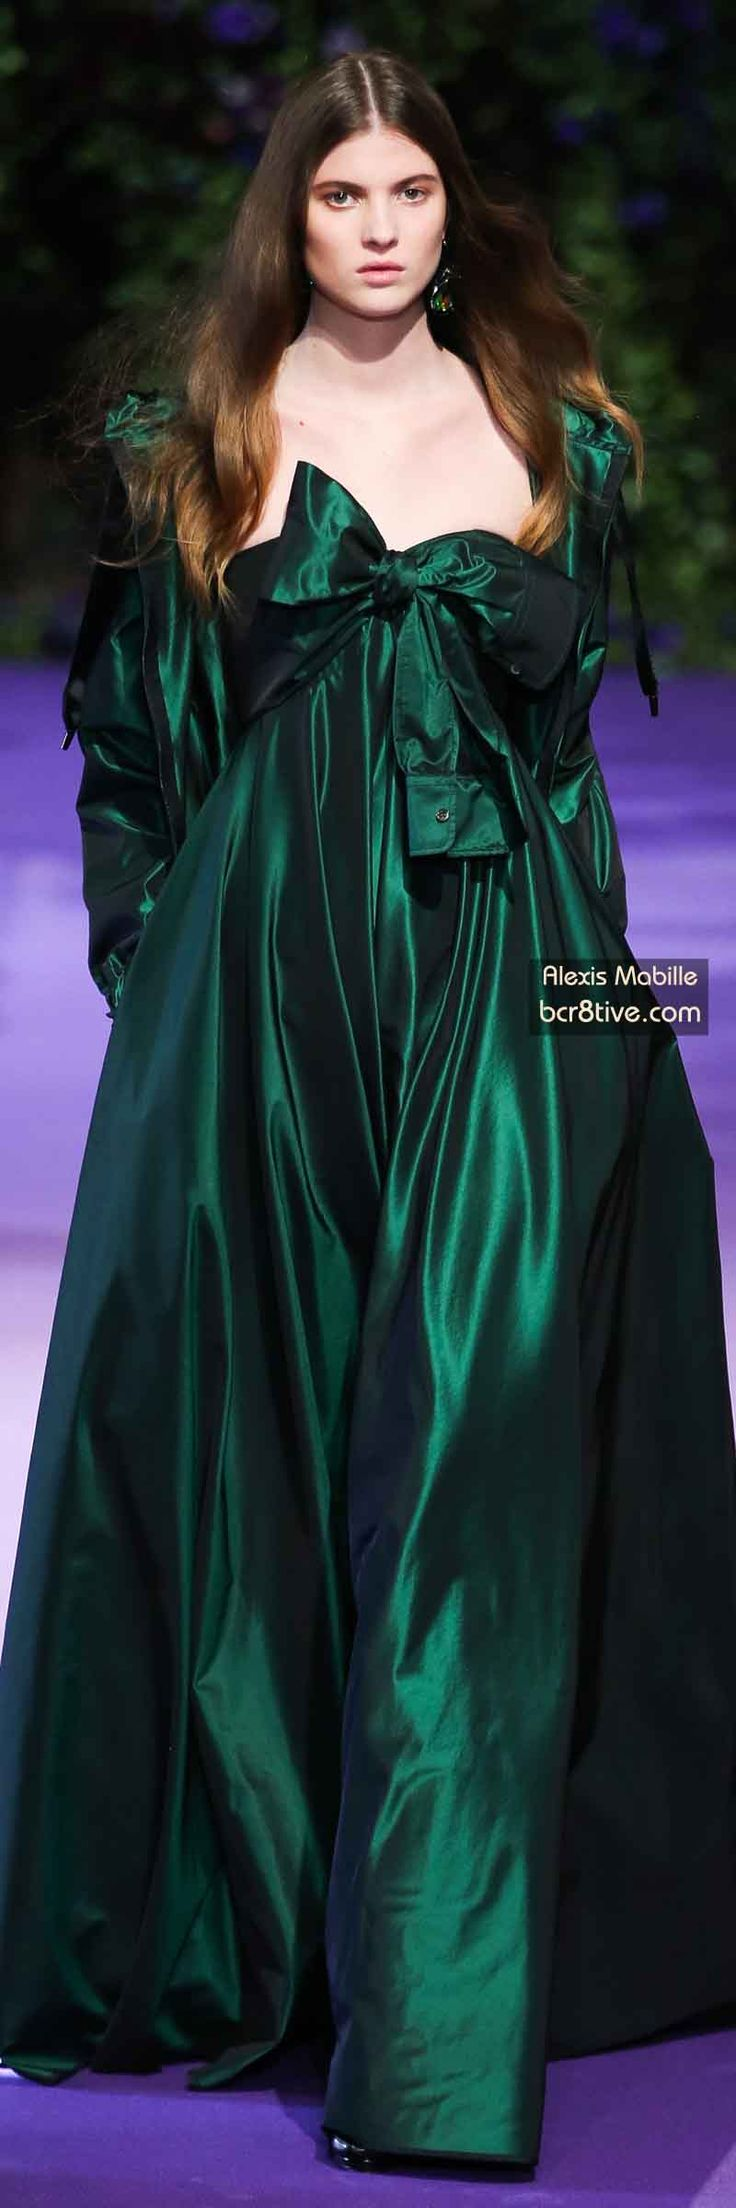 The Best Gowns of Fall 2014 Fashion Week International: Alexis Mabille FW 2014 #ParisFashionWeek